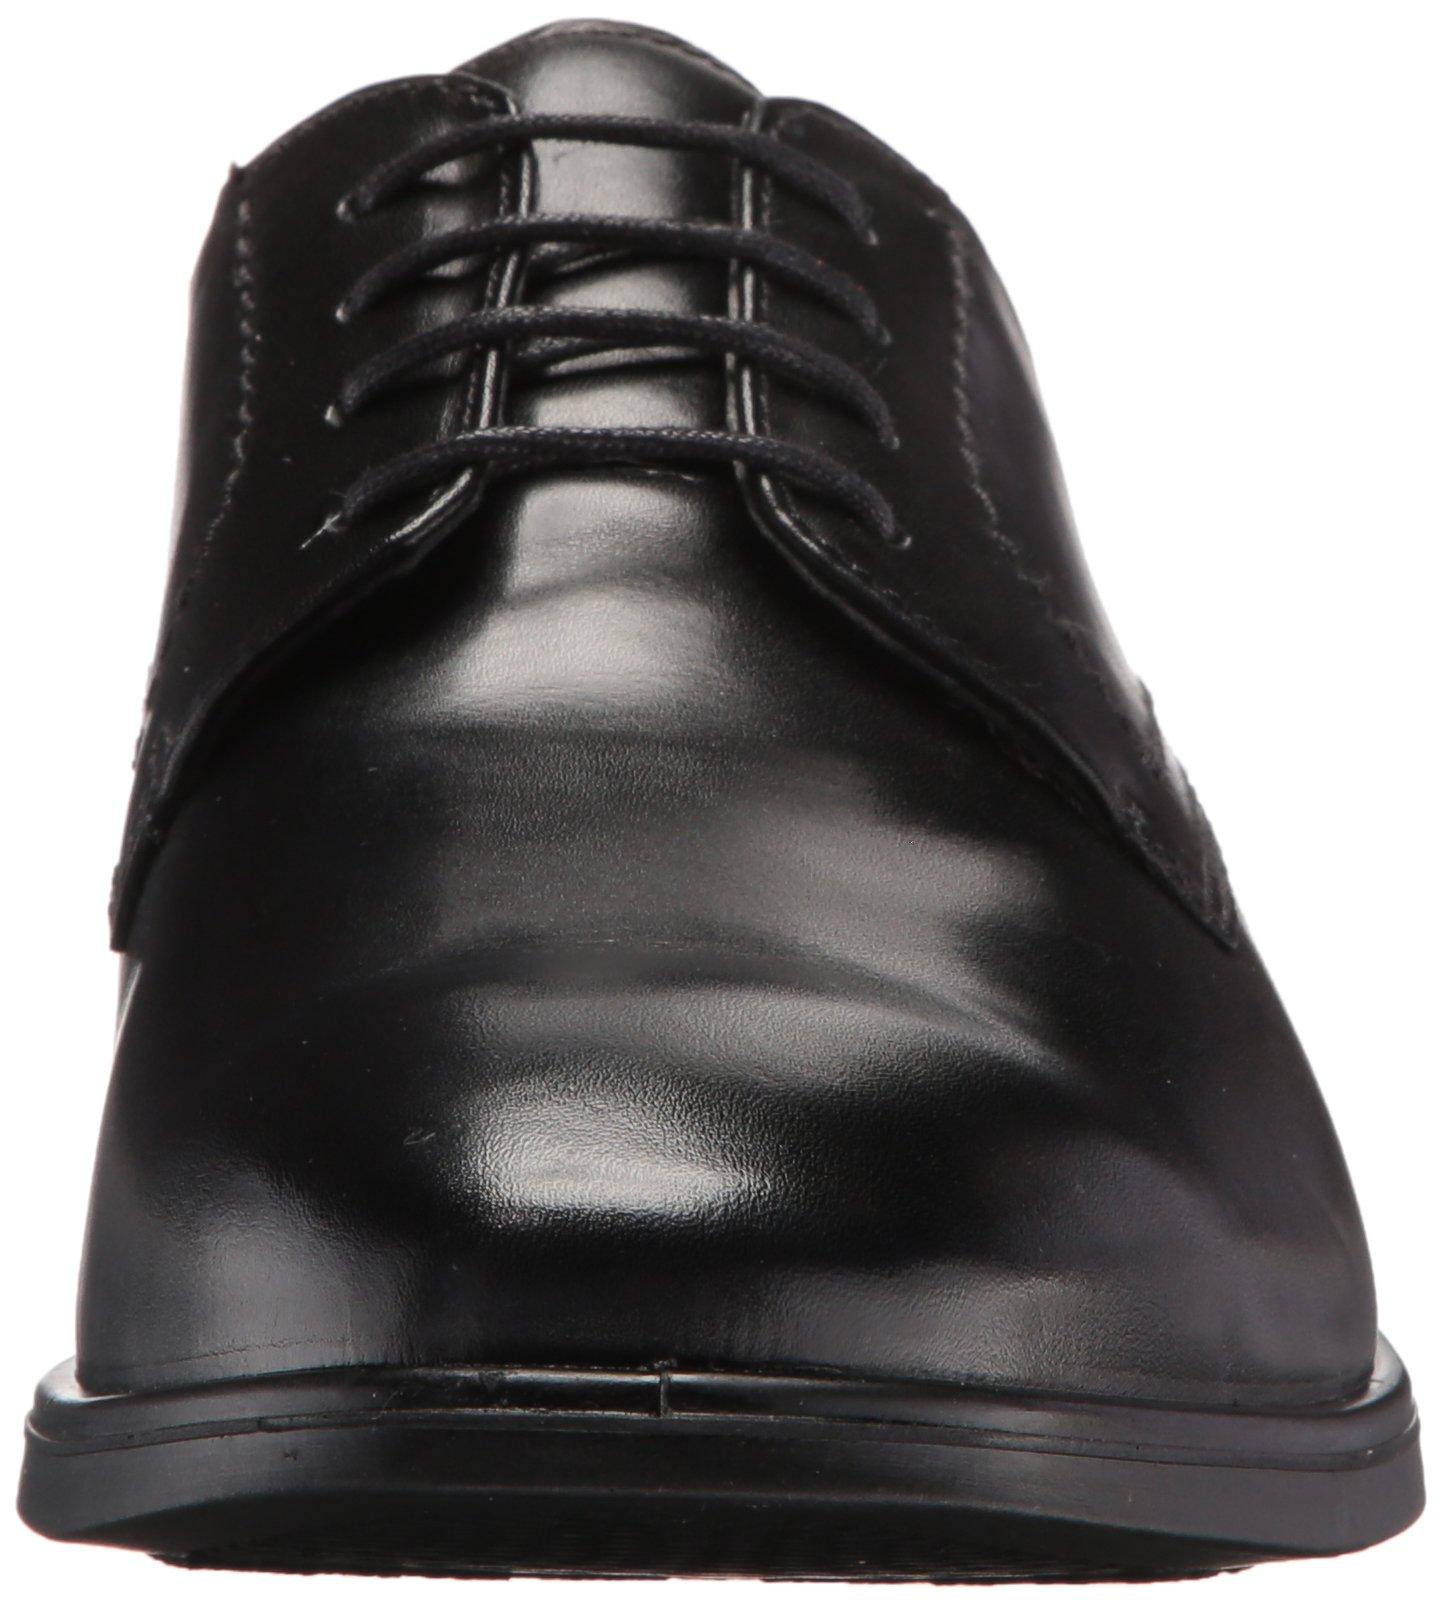 ECCO Men's Melbourne Tie Oxford, Black/Magnet, 43 EU/9-9.5 M US by ECCO (Image #4)